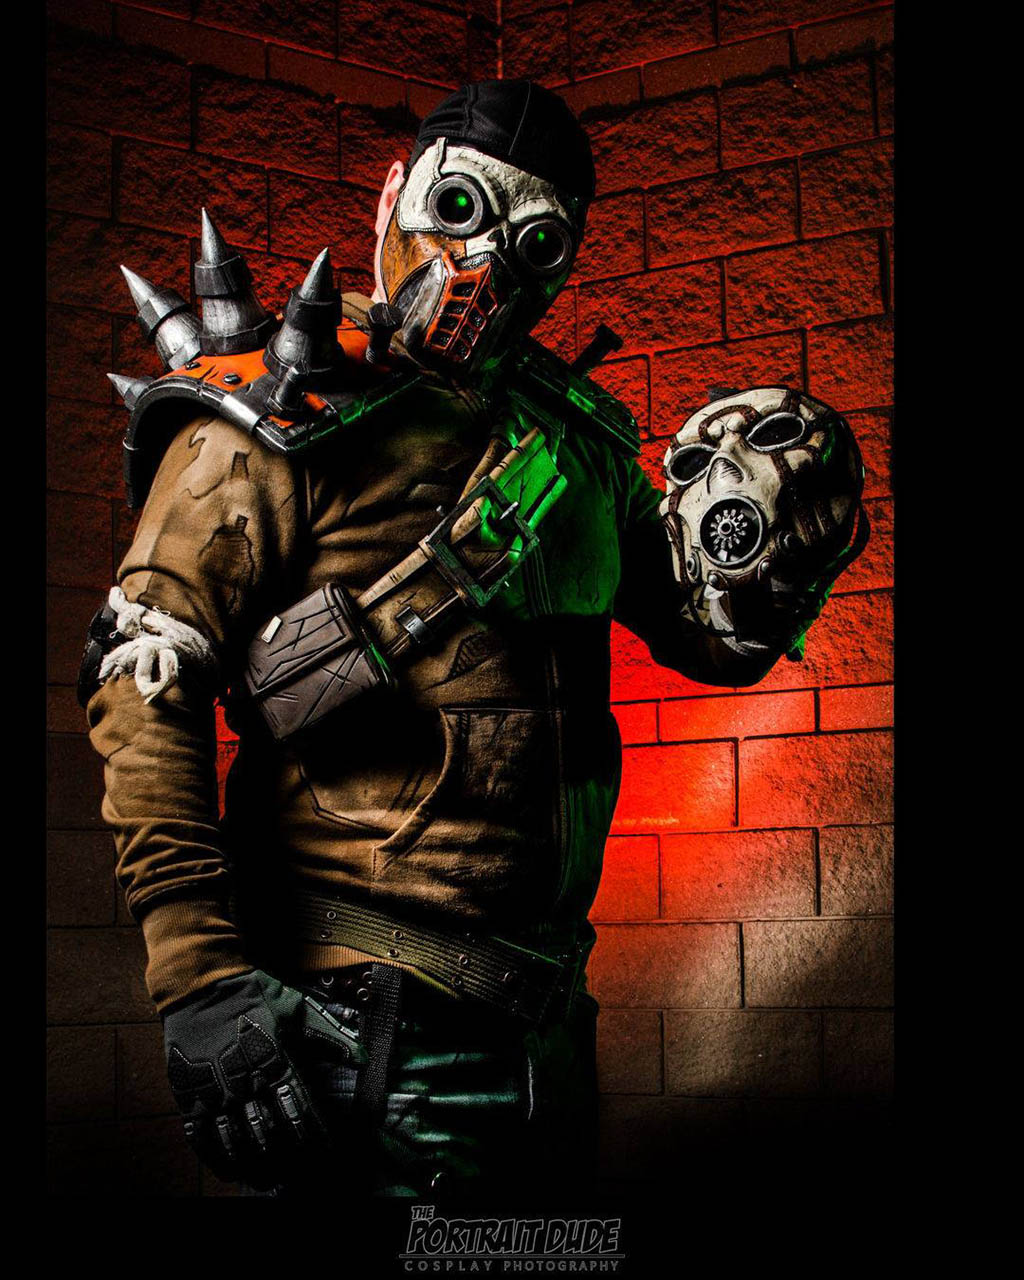 Psycho Bandit Steve a Borderlands-ból